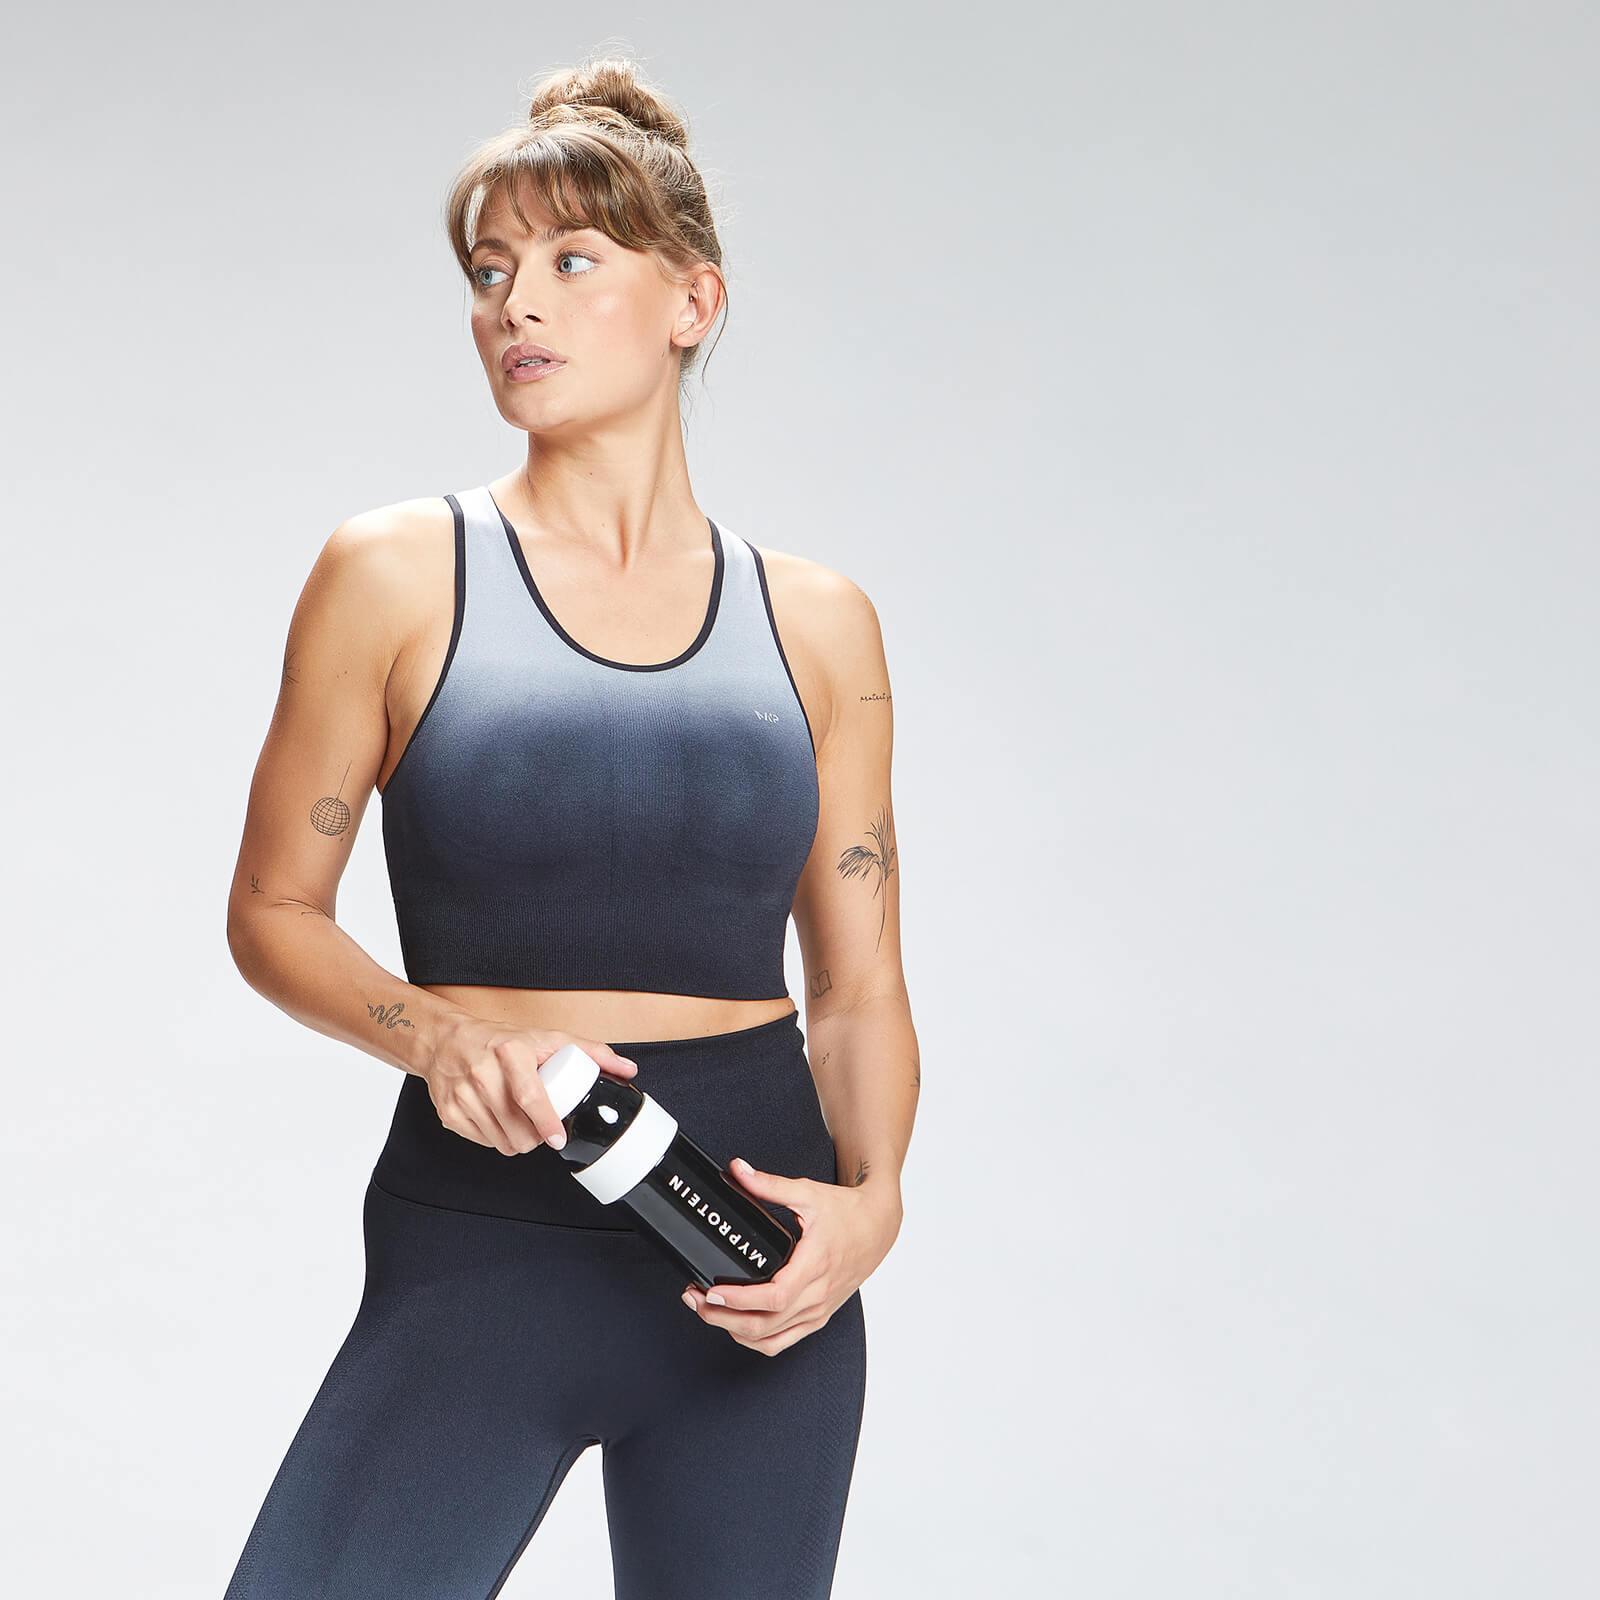 Купить MP Women's Velocity Seamless Sports Bra - Black - XXS, Myprotein International